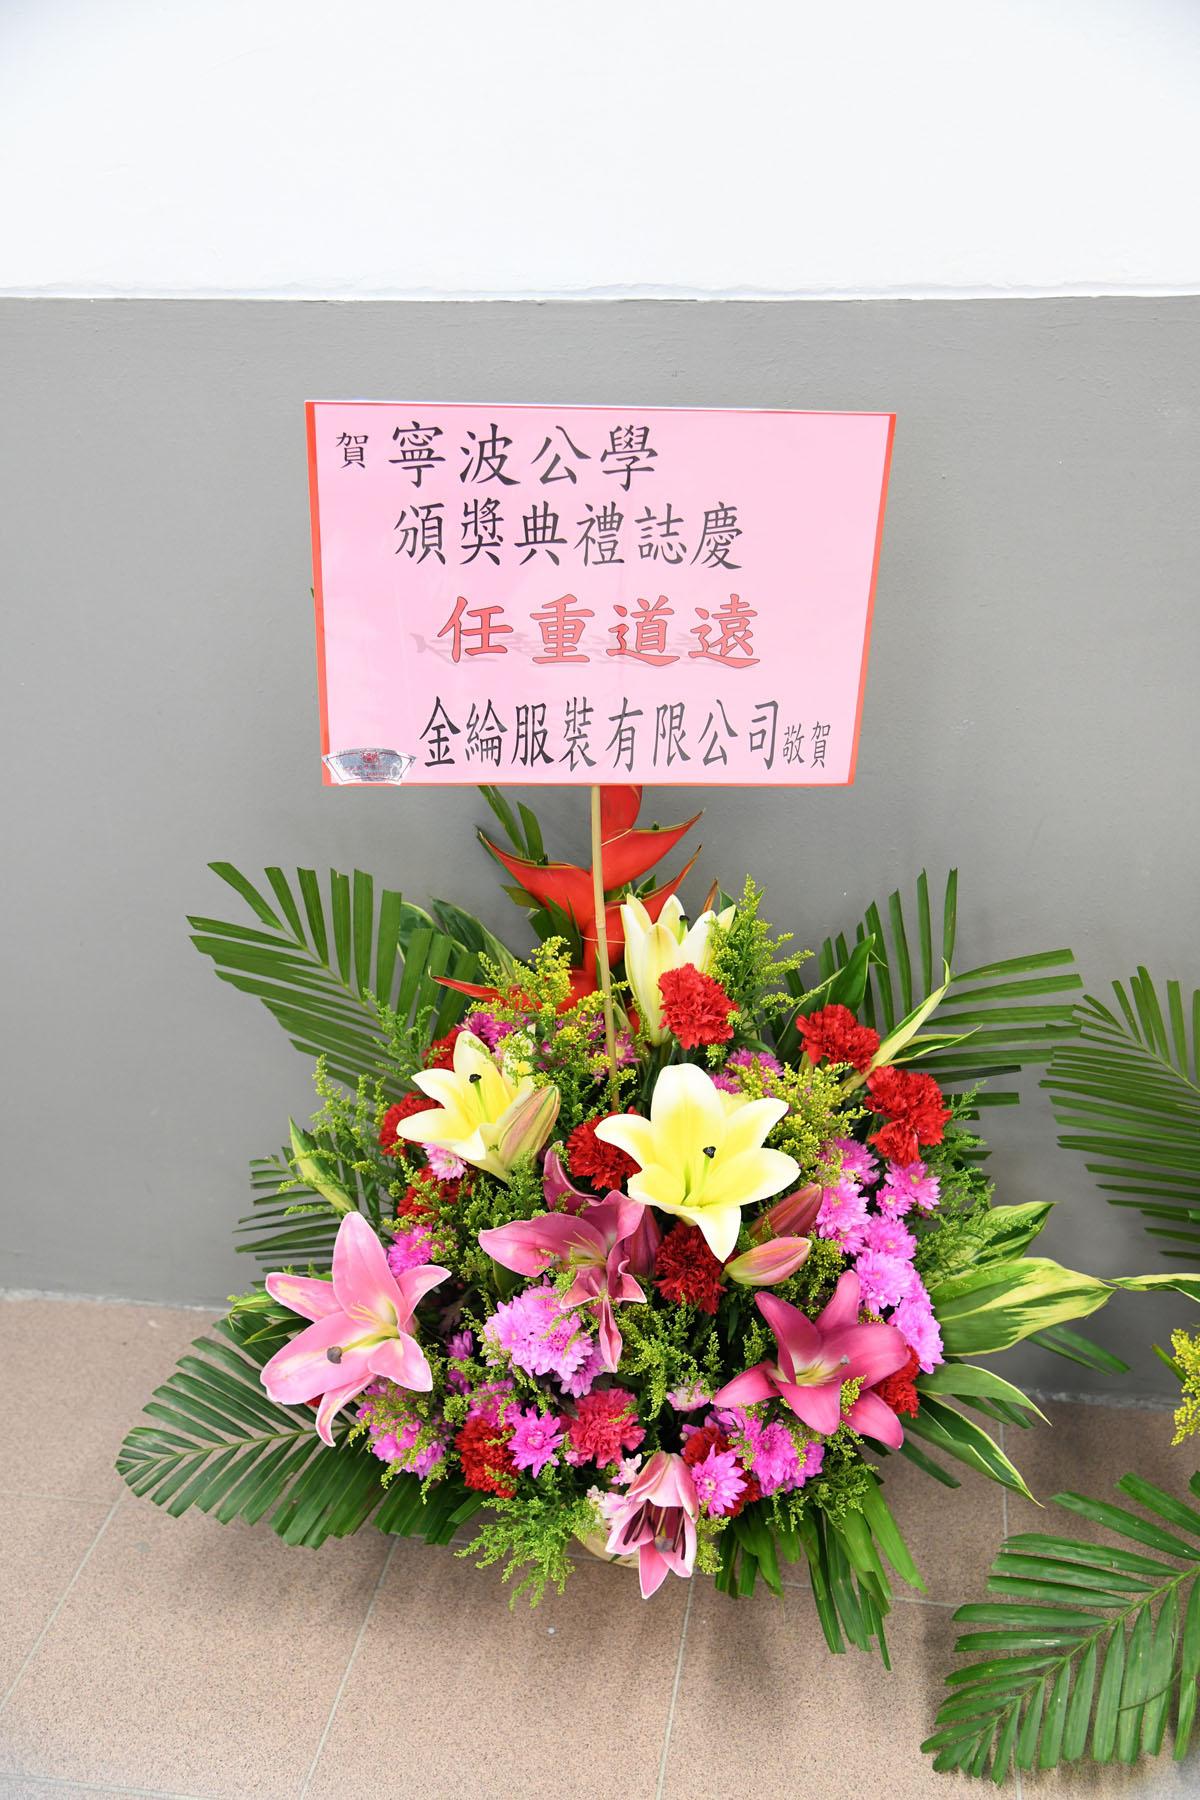 http://www.npc.edu.hk/sites/default/files/dsc_0234.jpg